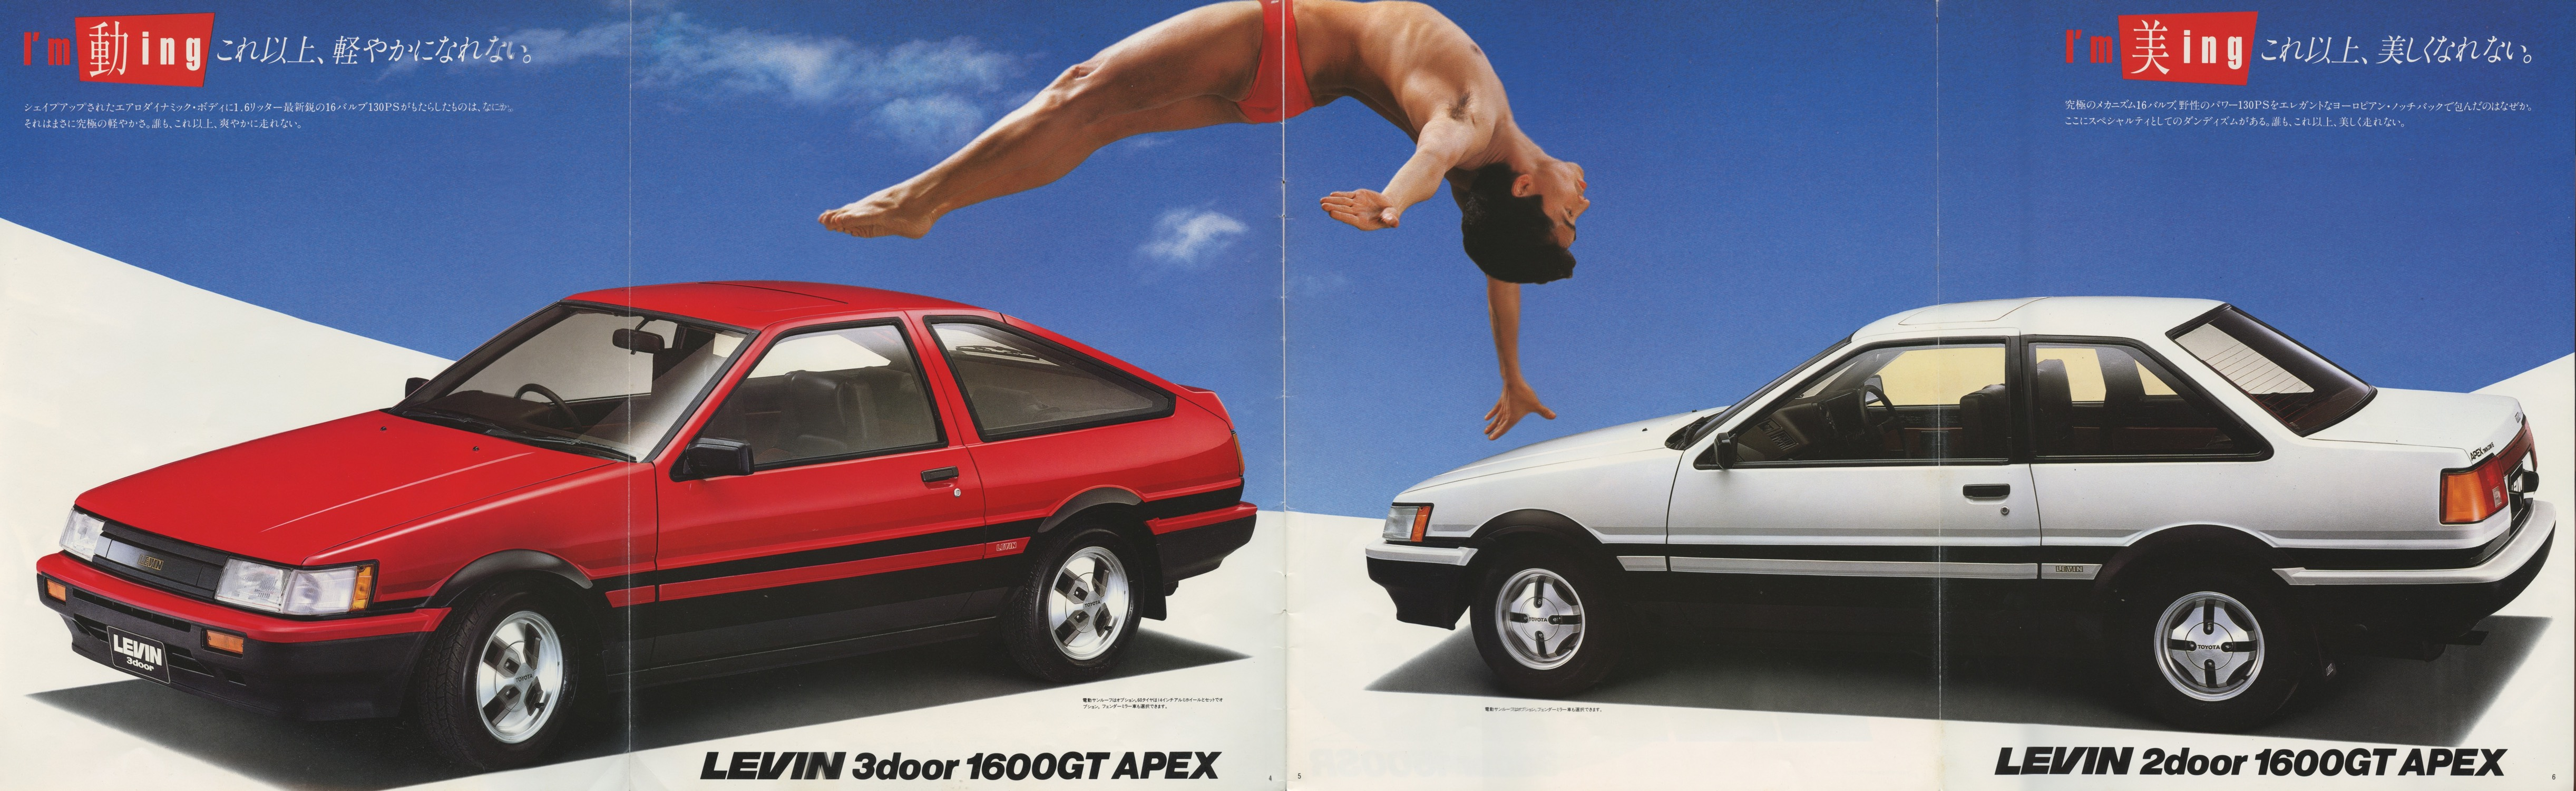 toyota-corolla-levin-ae86-brochure-page-03-04-05-06-small